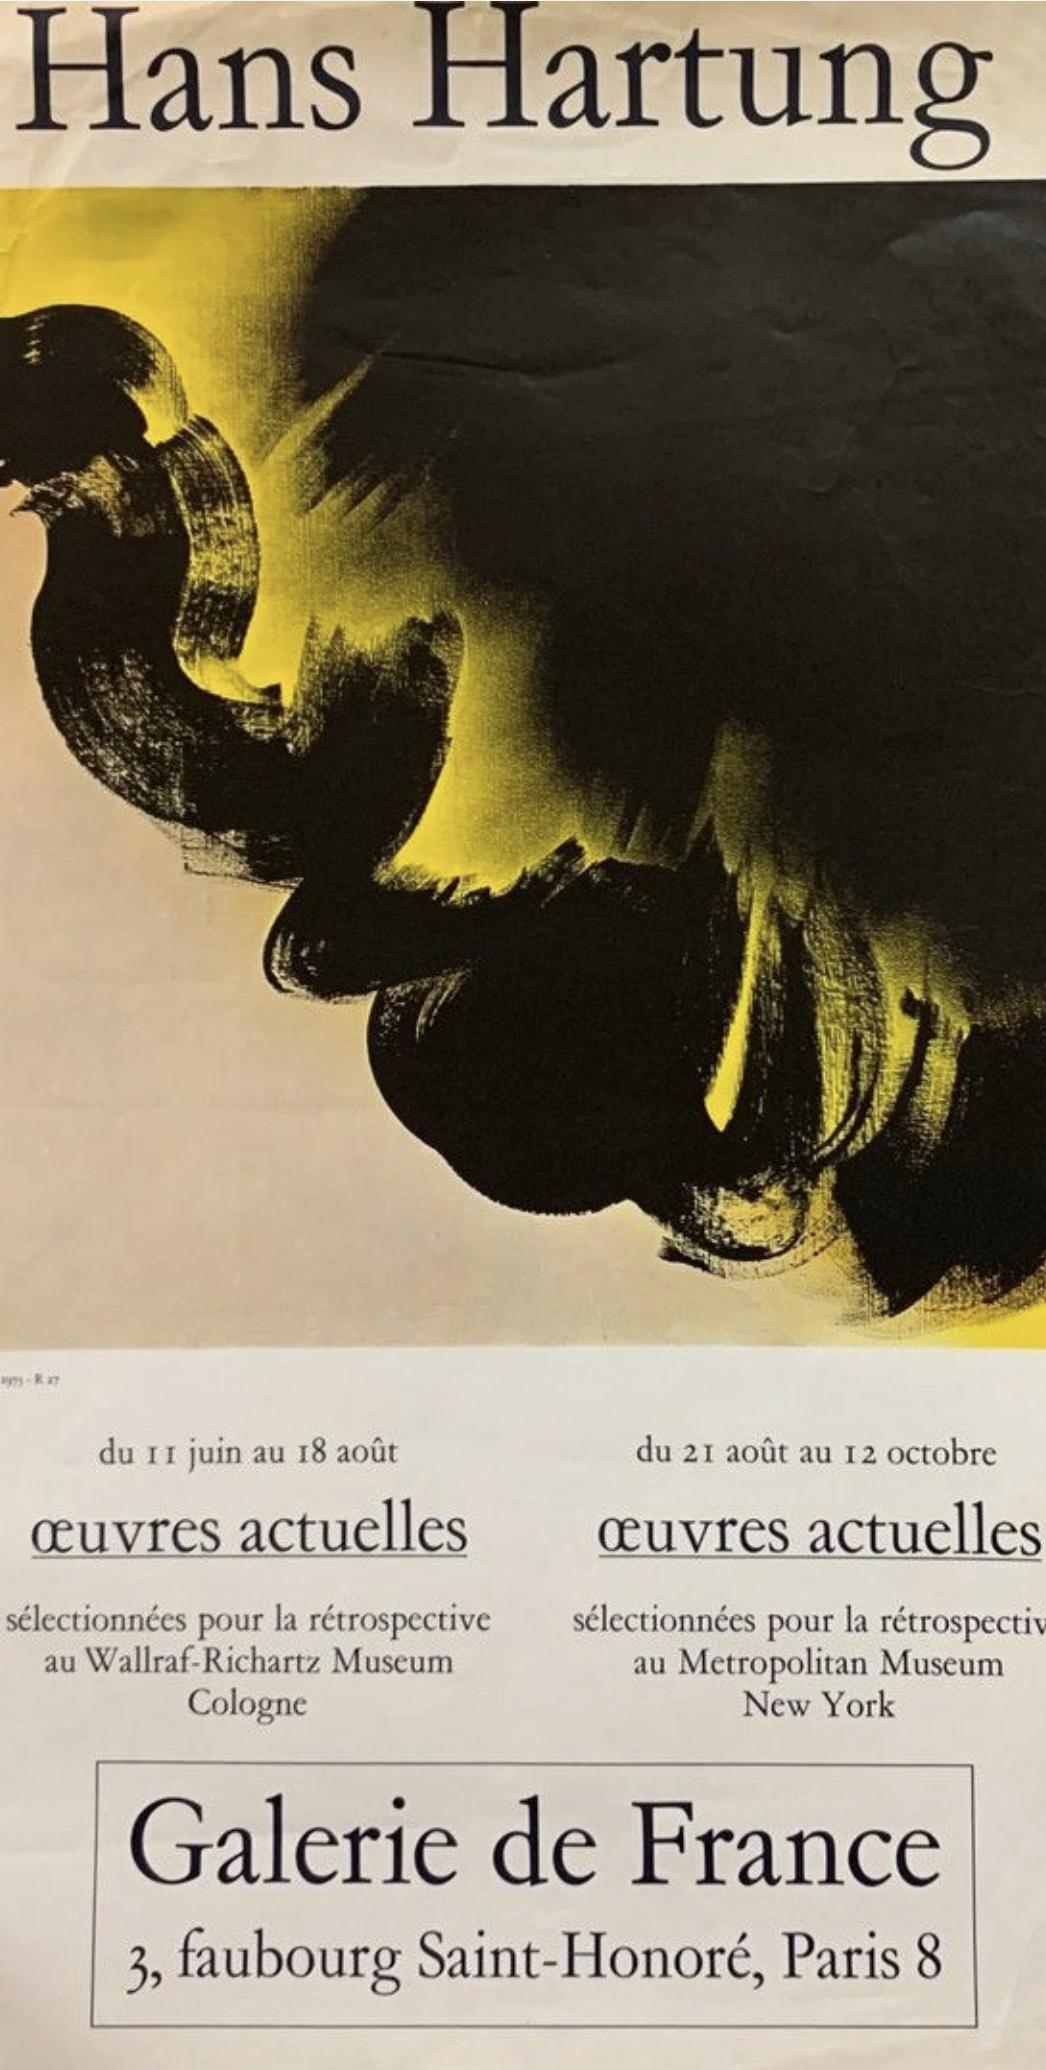 HANS HARTUNG Original Vintage Poster Letitia Morris Gallery